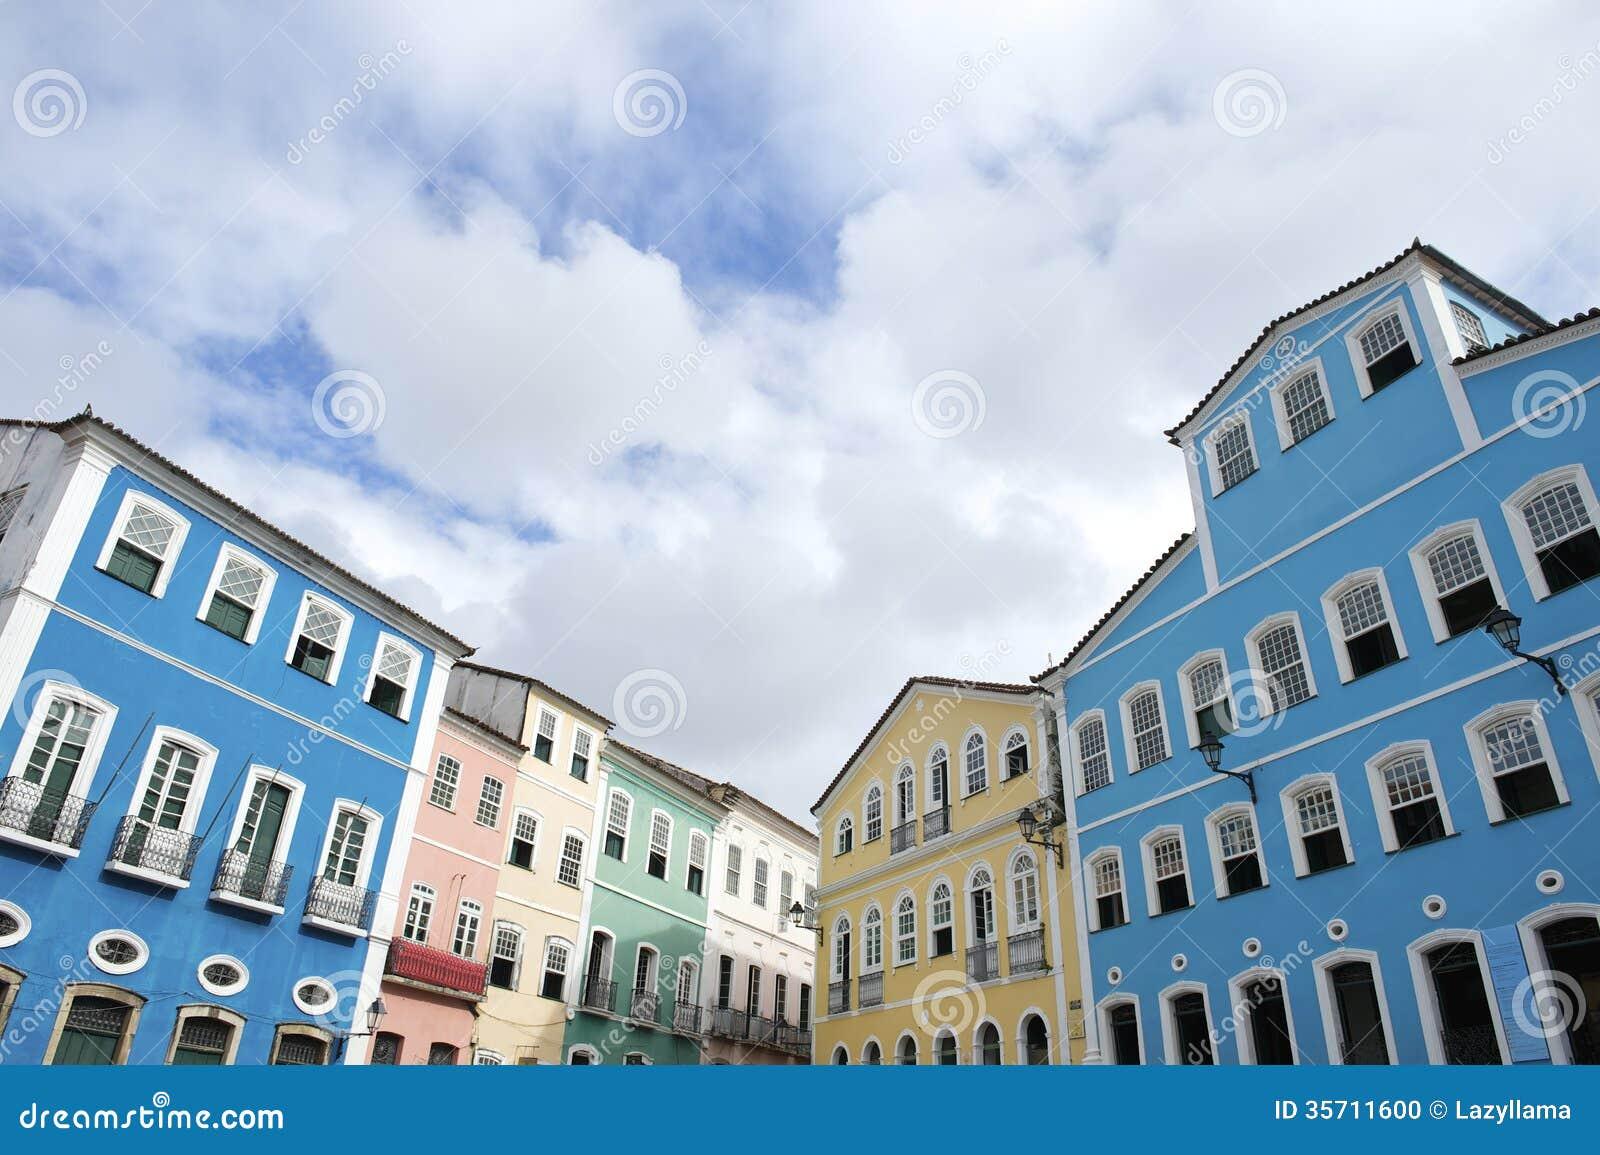 Architecture coloniale colorée Pelourinho Salvador Brazil